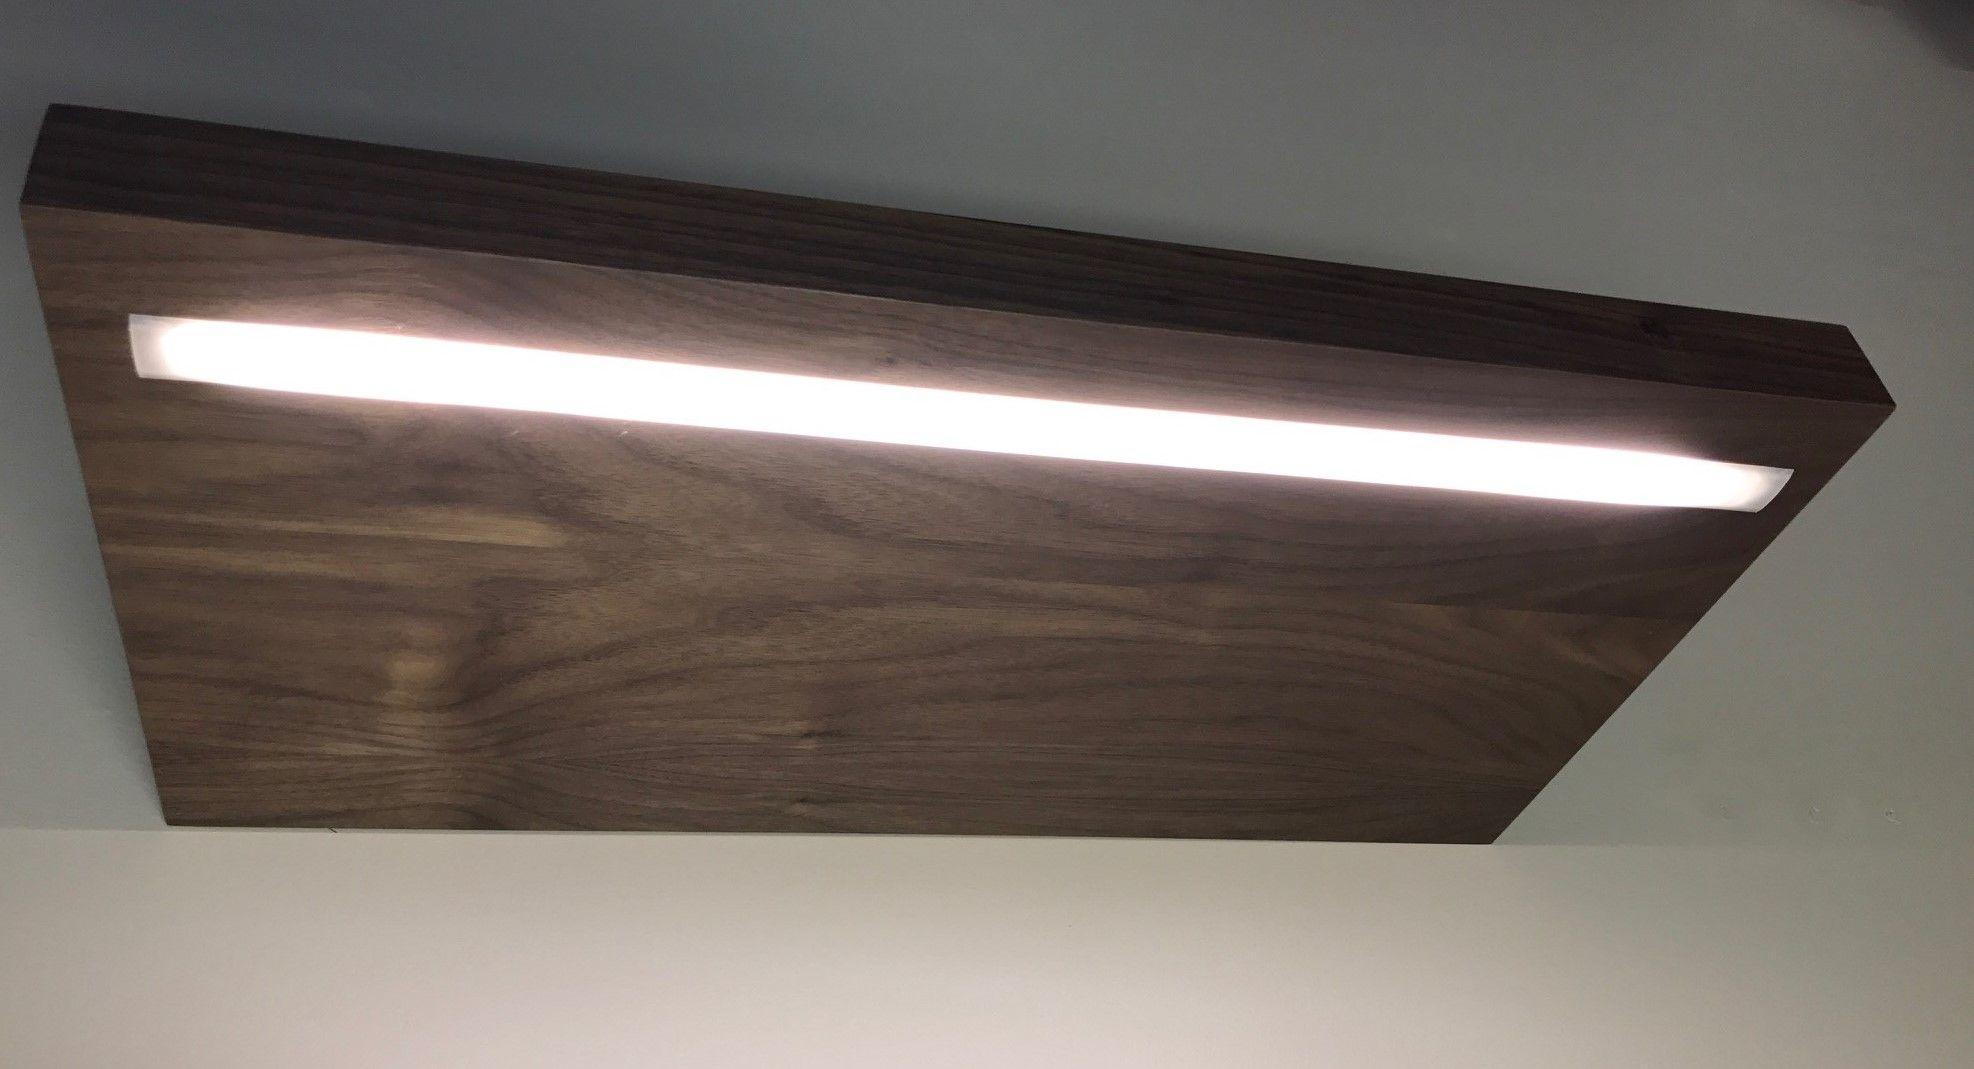 Floating Shelf Recessed Lighting Led Shelf Lighting Floating Shelves With Lights Shelf Lighting